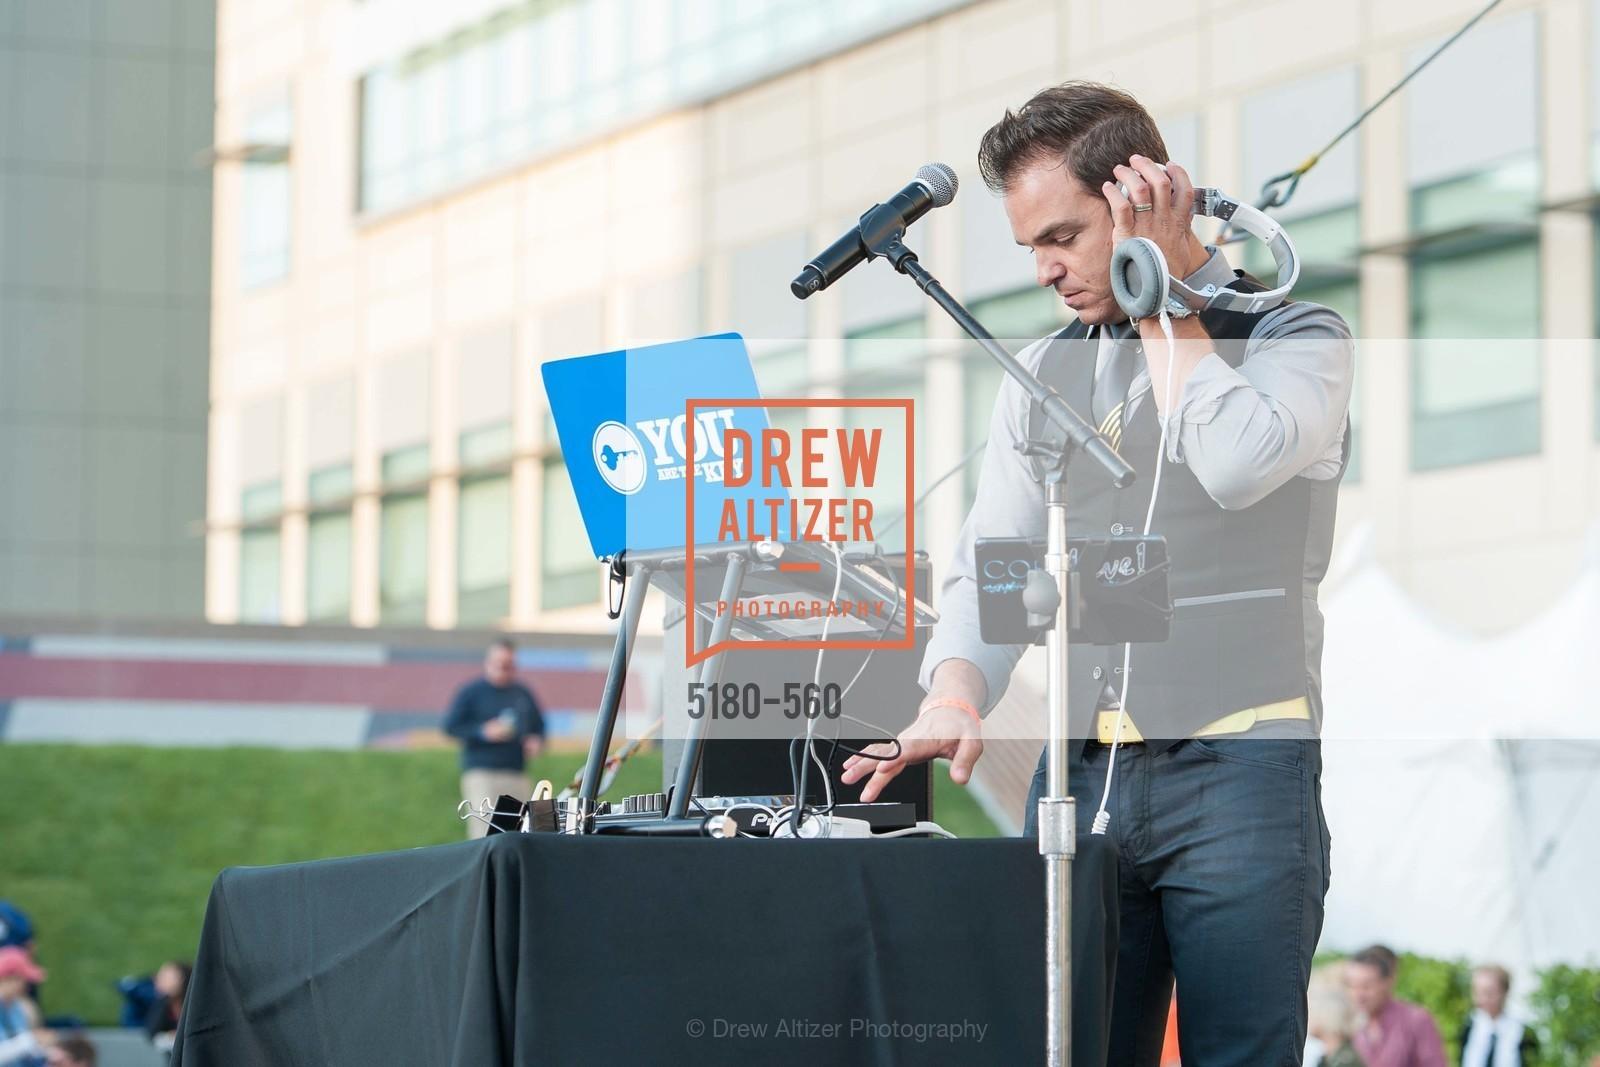 Performance By DJ Cory Live!, Photo #5180-560